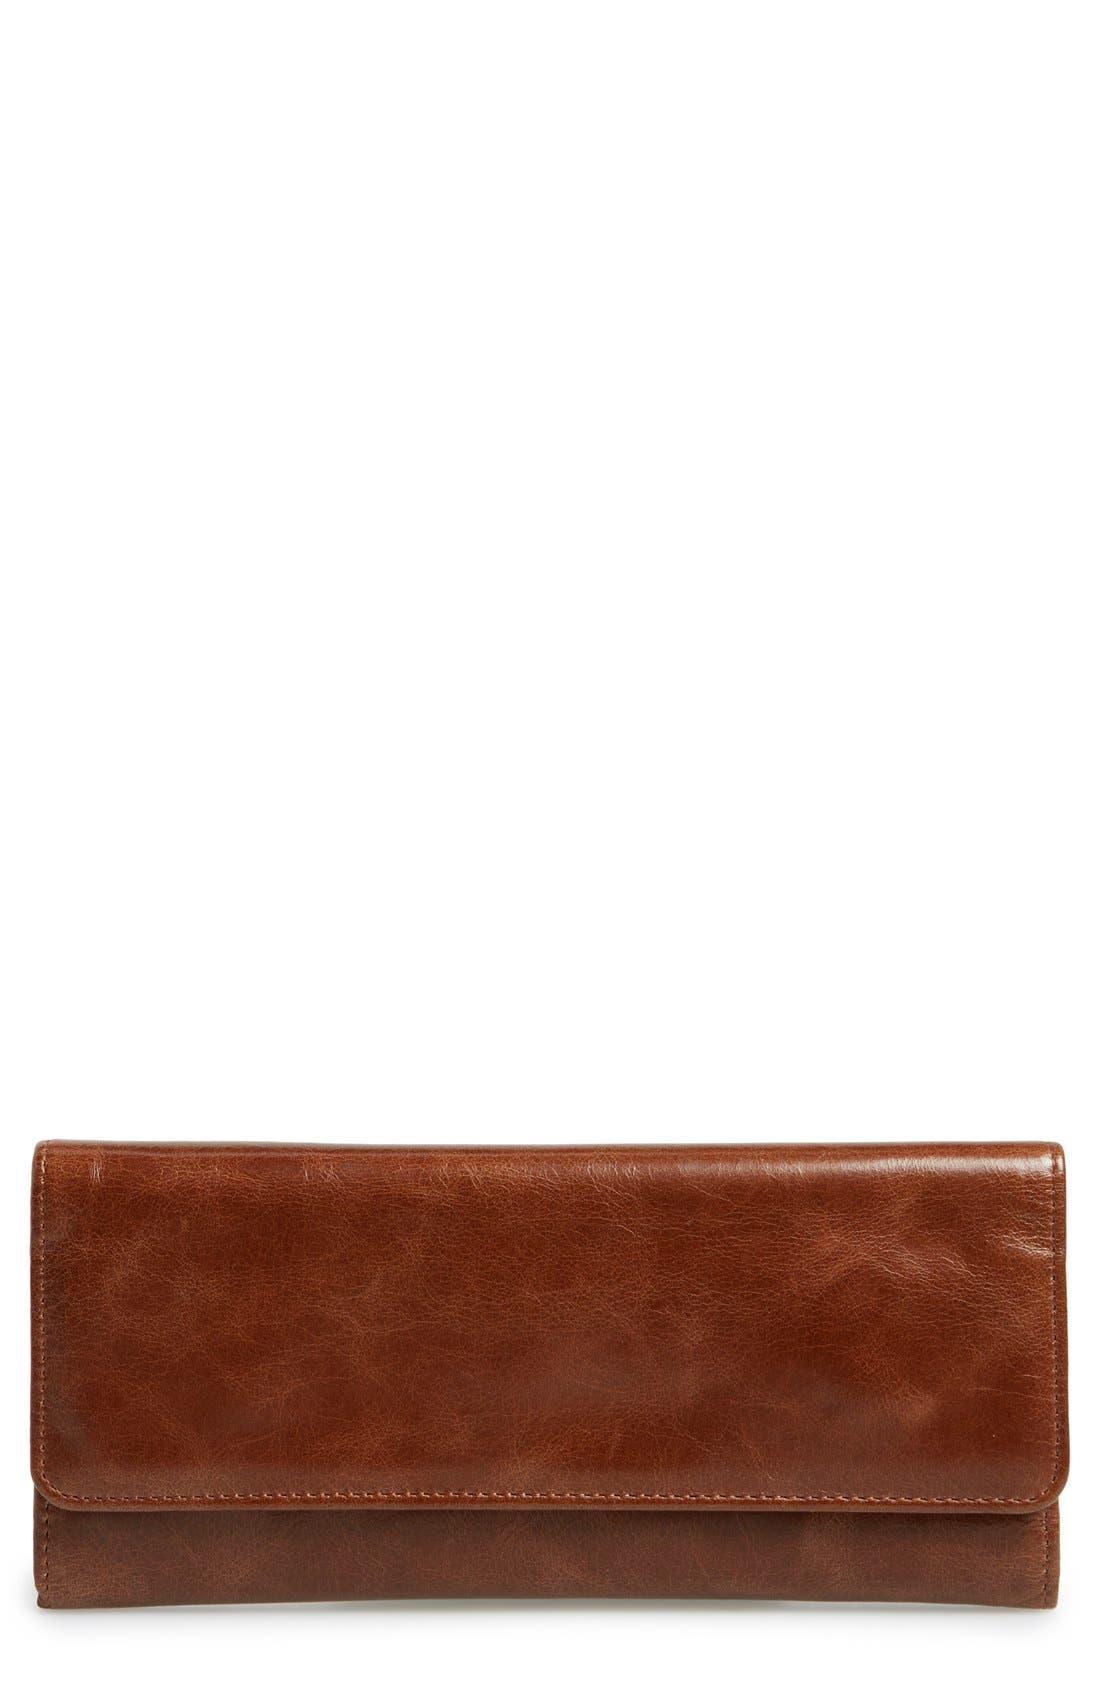 'Sadie' Leather Wallet,                             Main thumbnail 19, color,